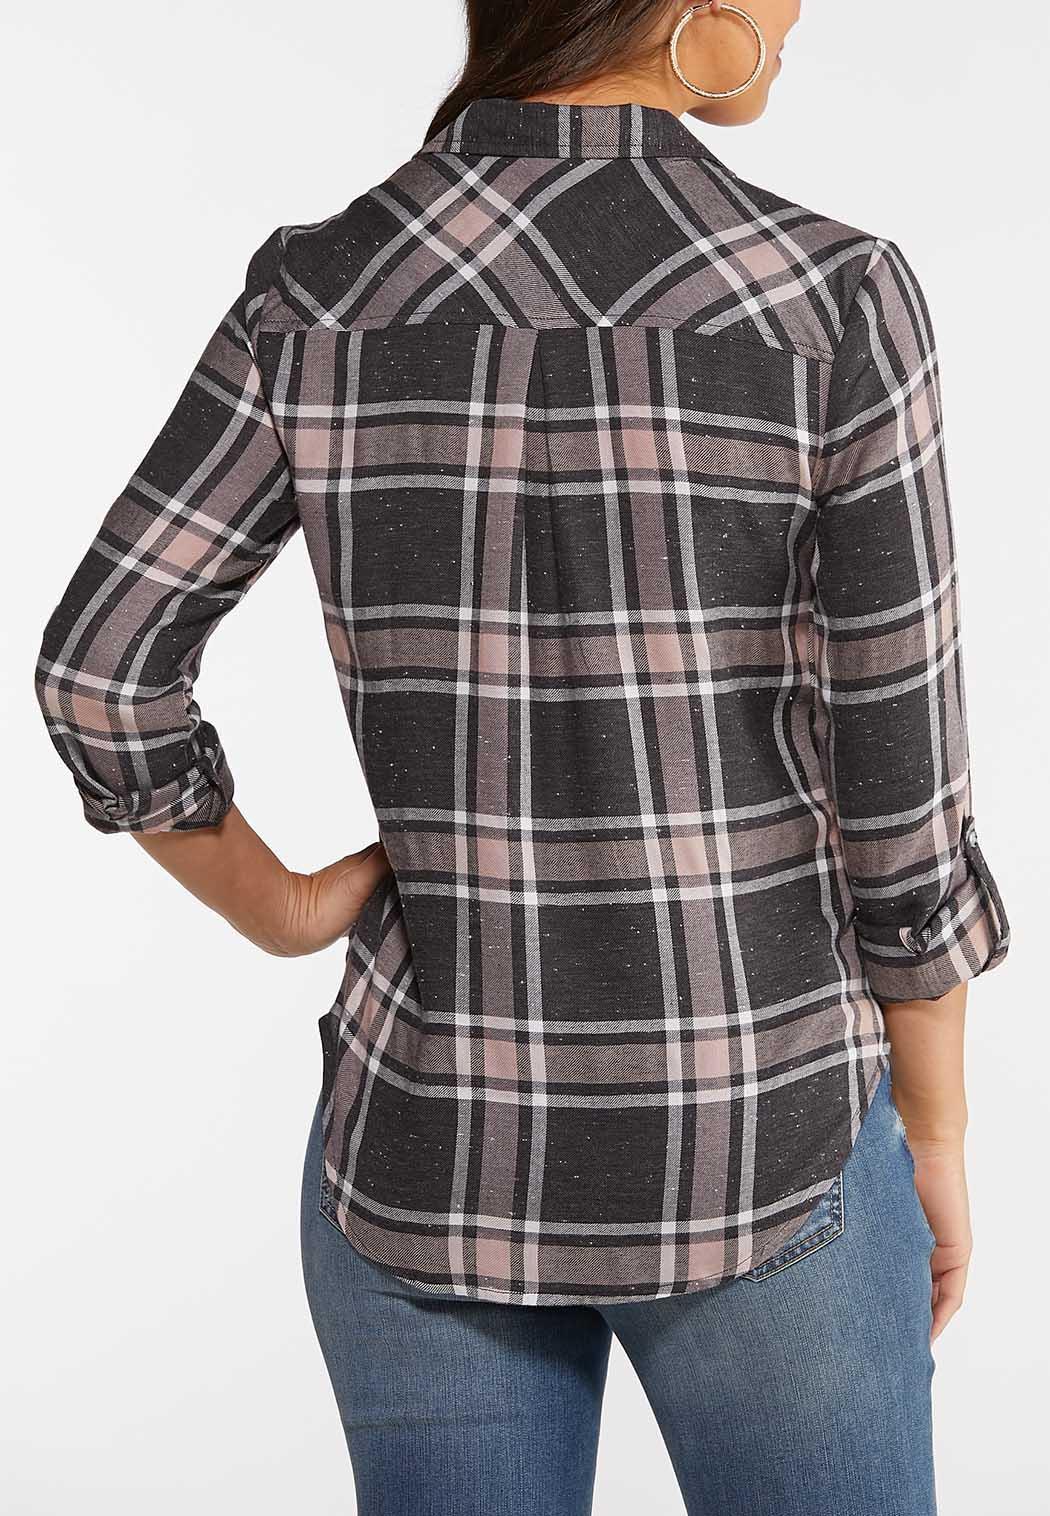 Gray Plaid Shirt (Item #44047180)